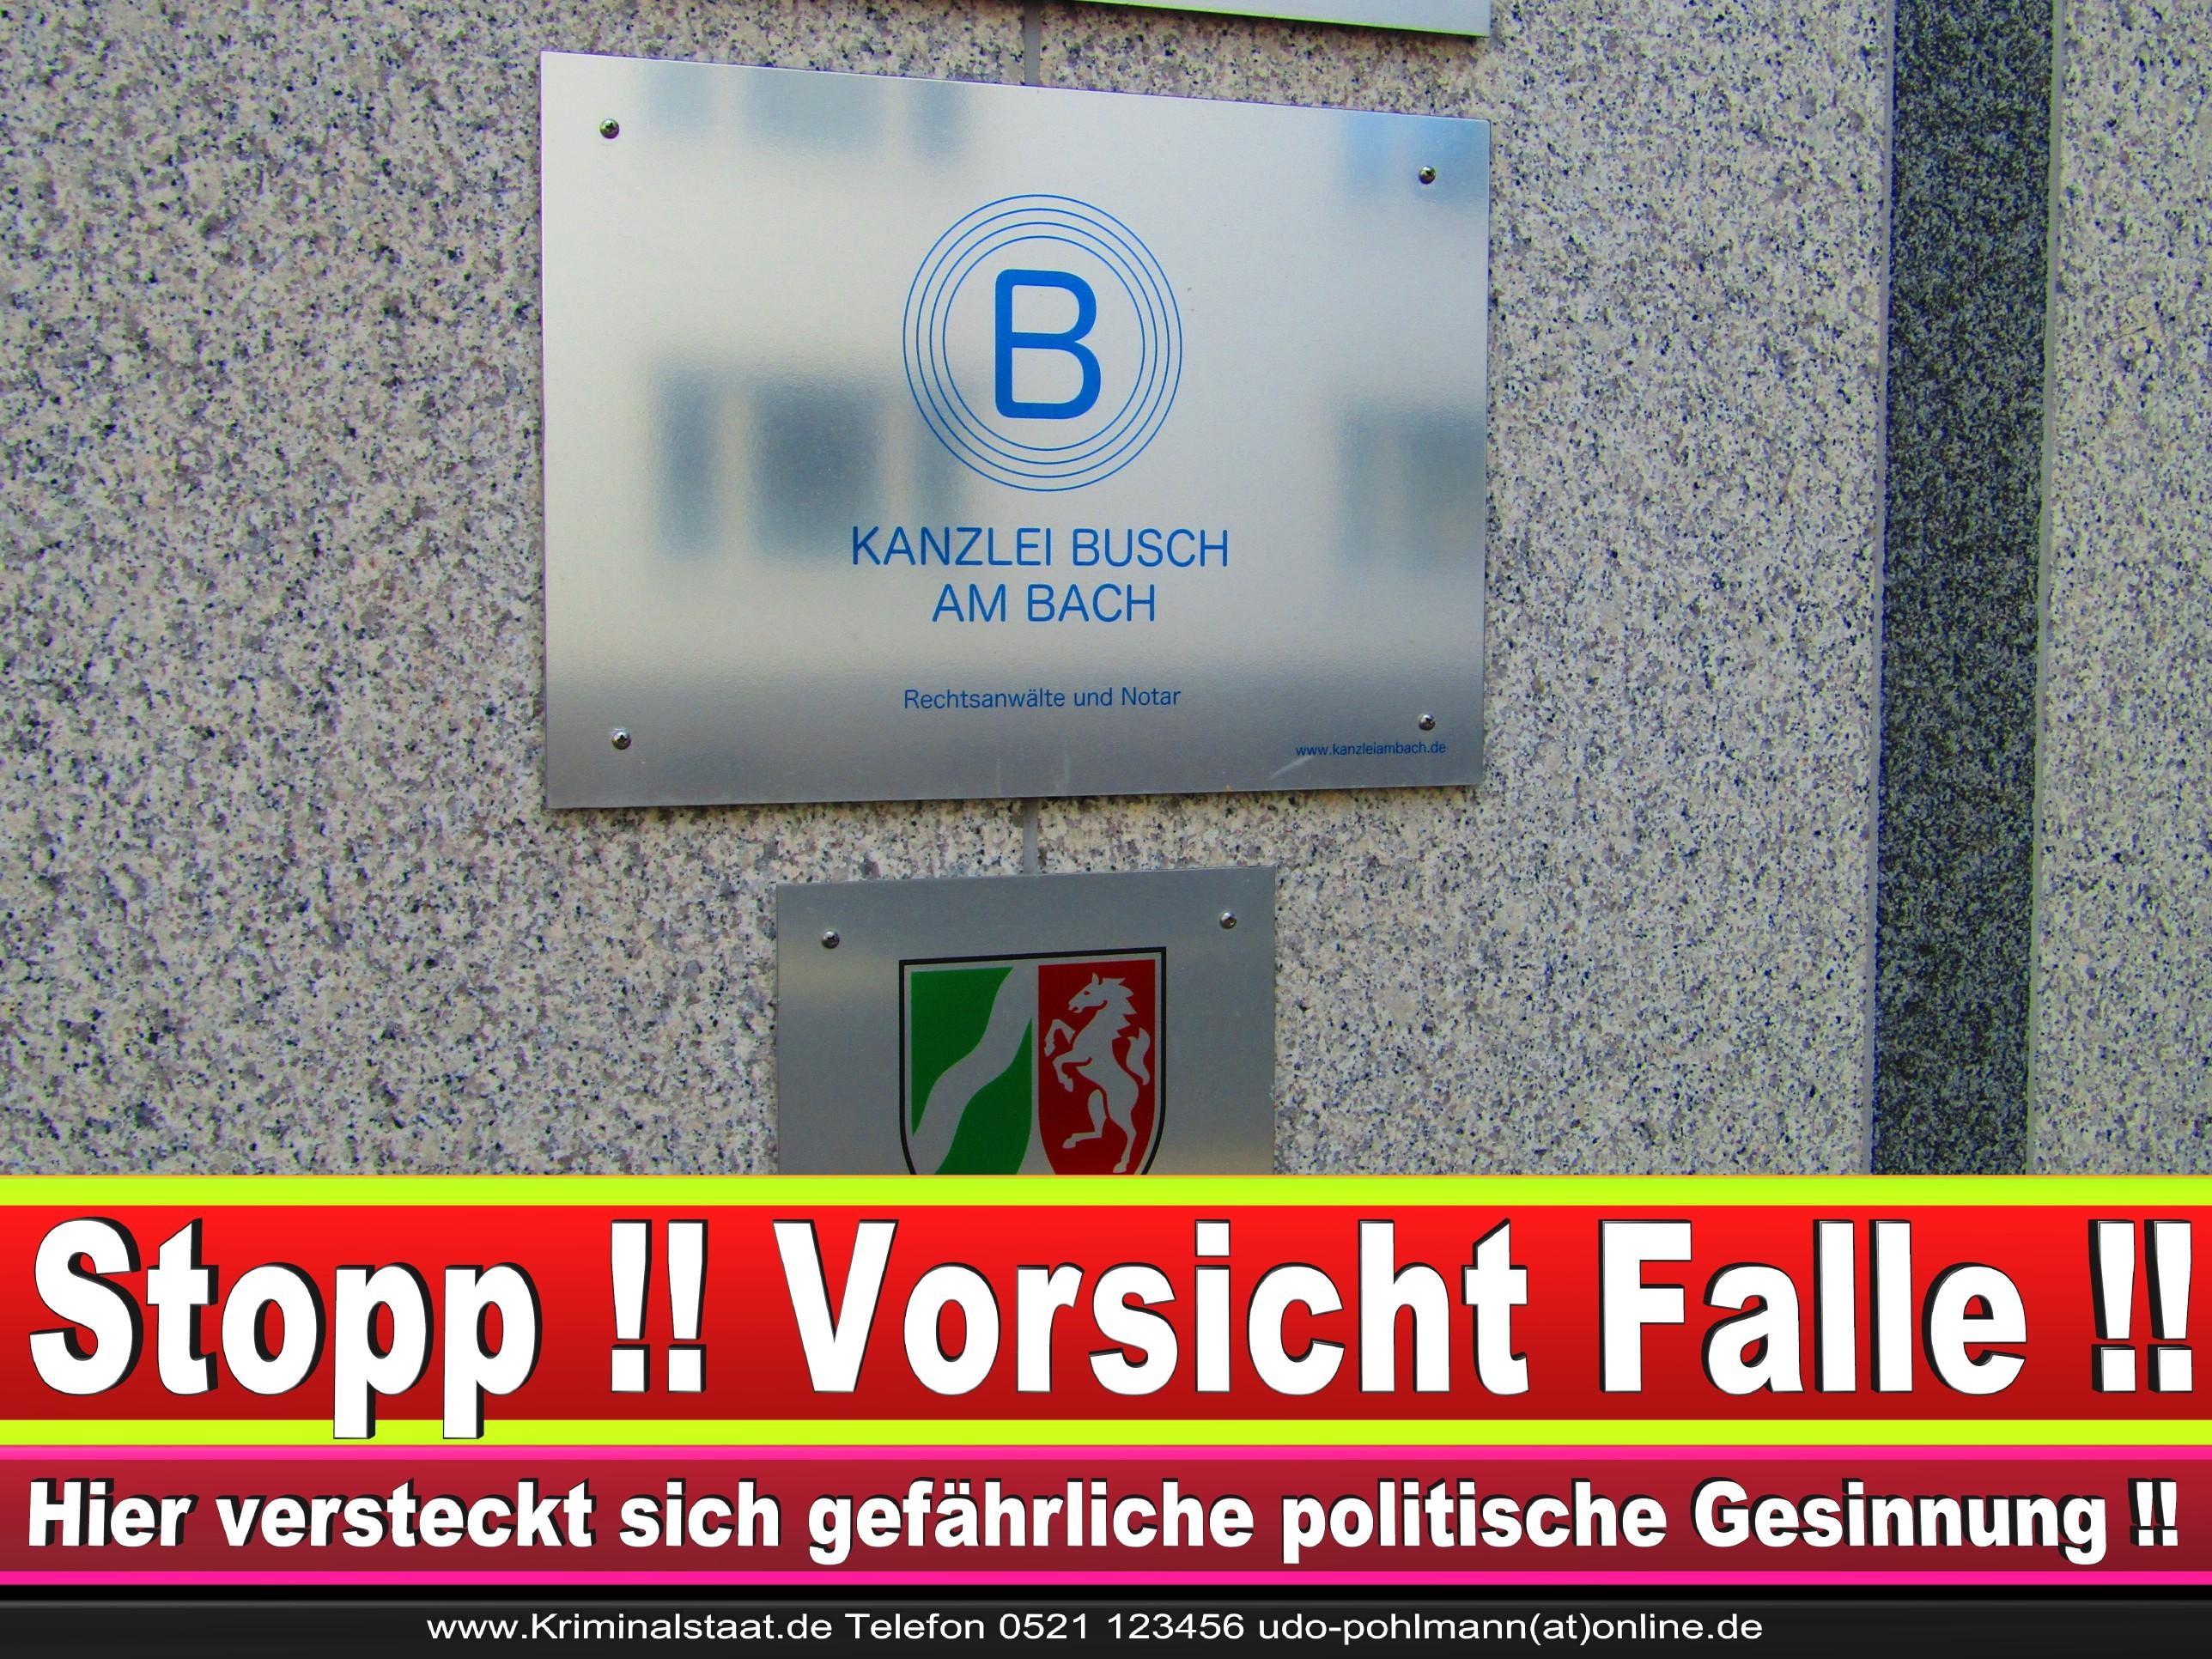 Rechtsanwältin Amelie Busch Am Bach 2 Bielefeld CDU 5